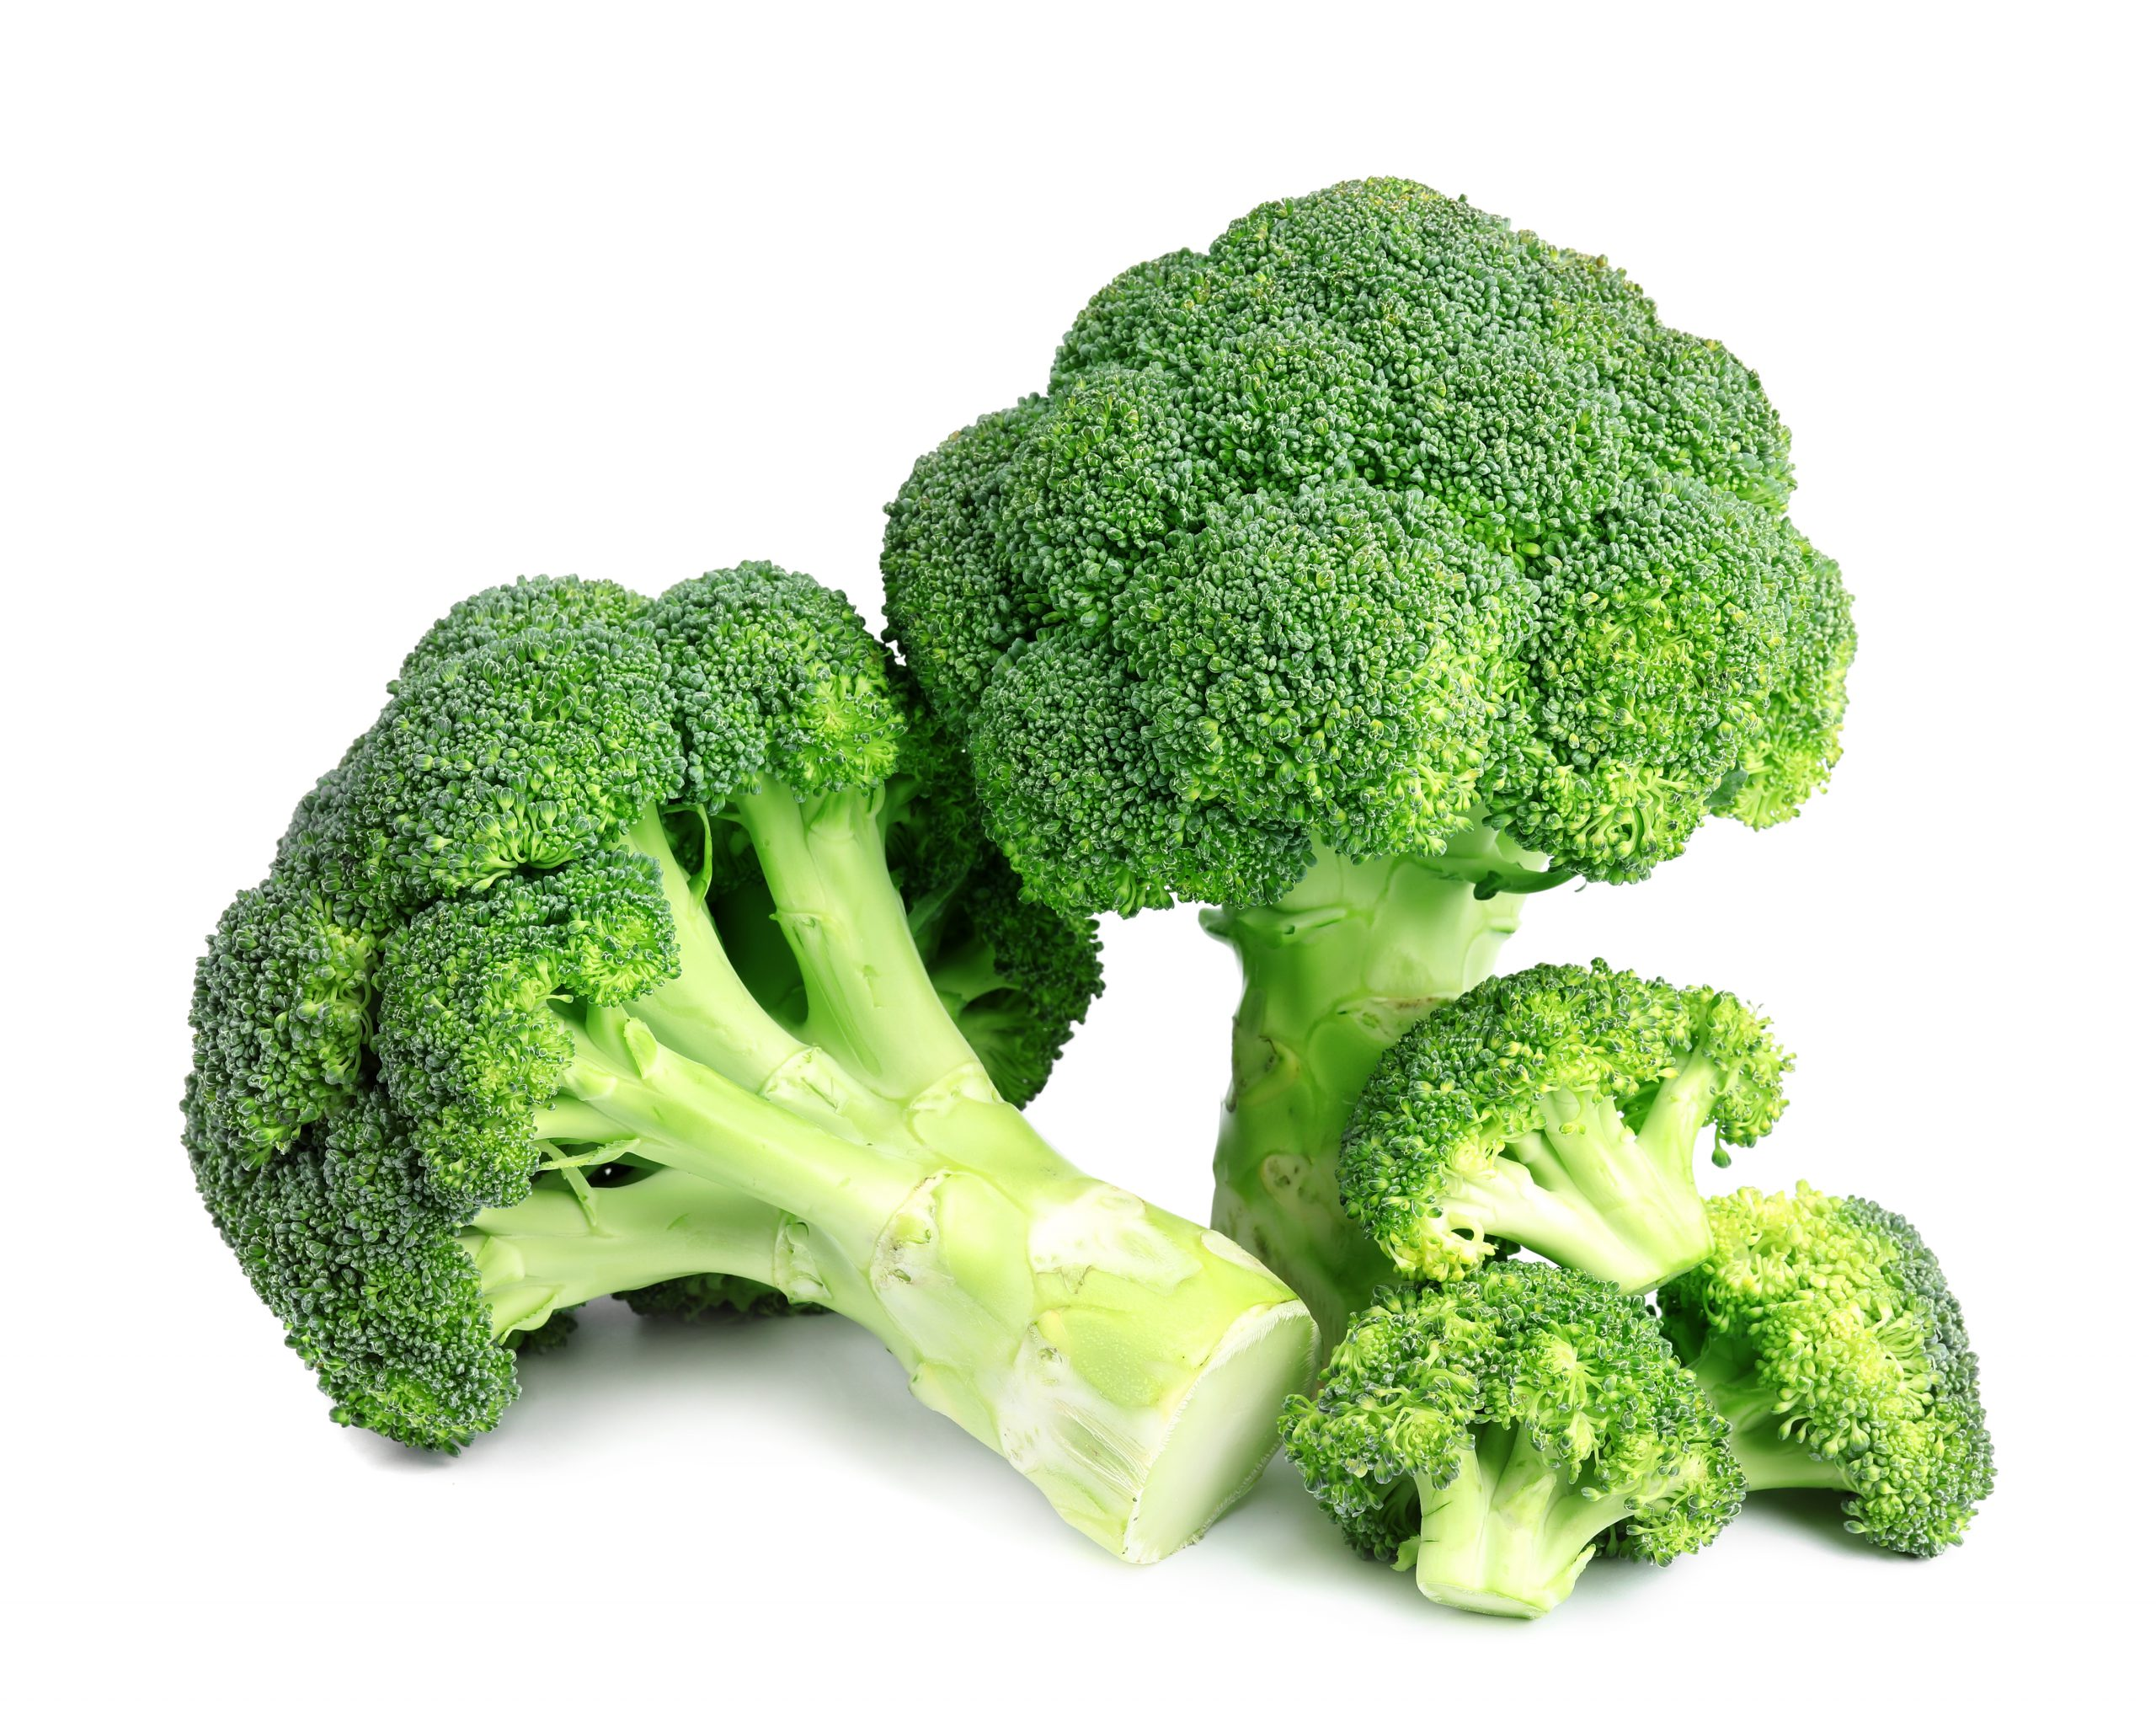 Broccoli Extract (สารสกัดจากบร็อกโคลี่)